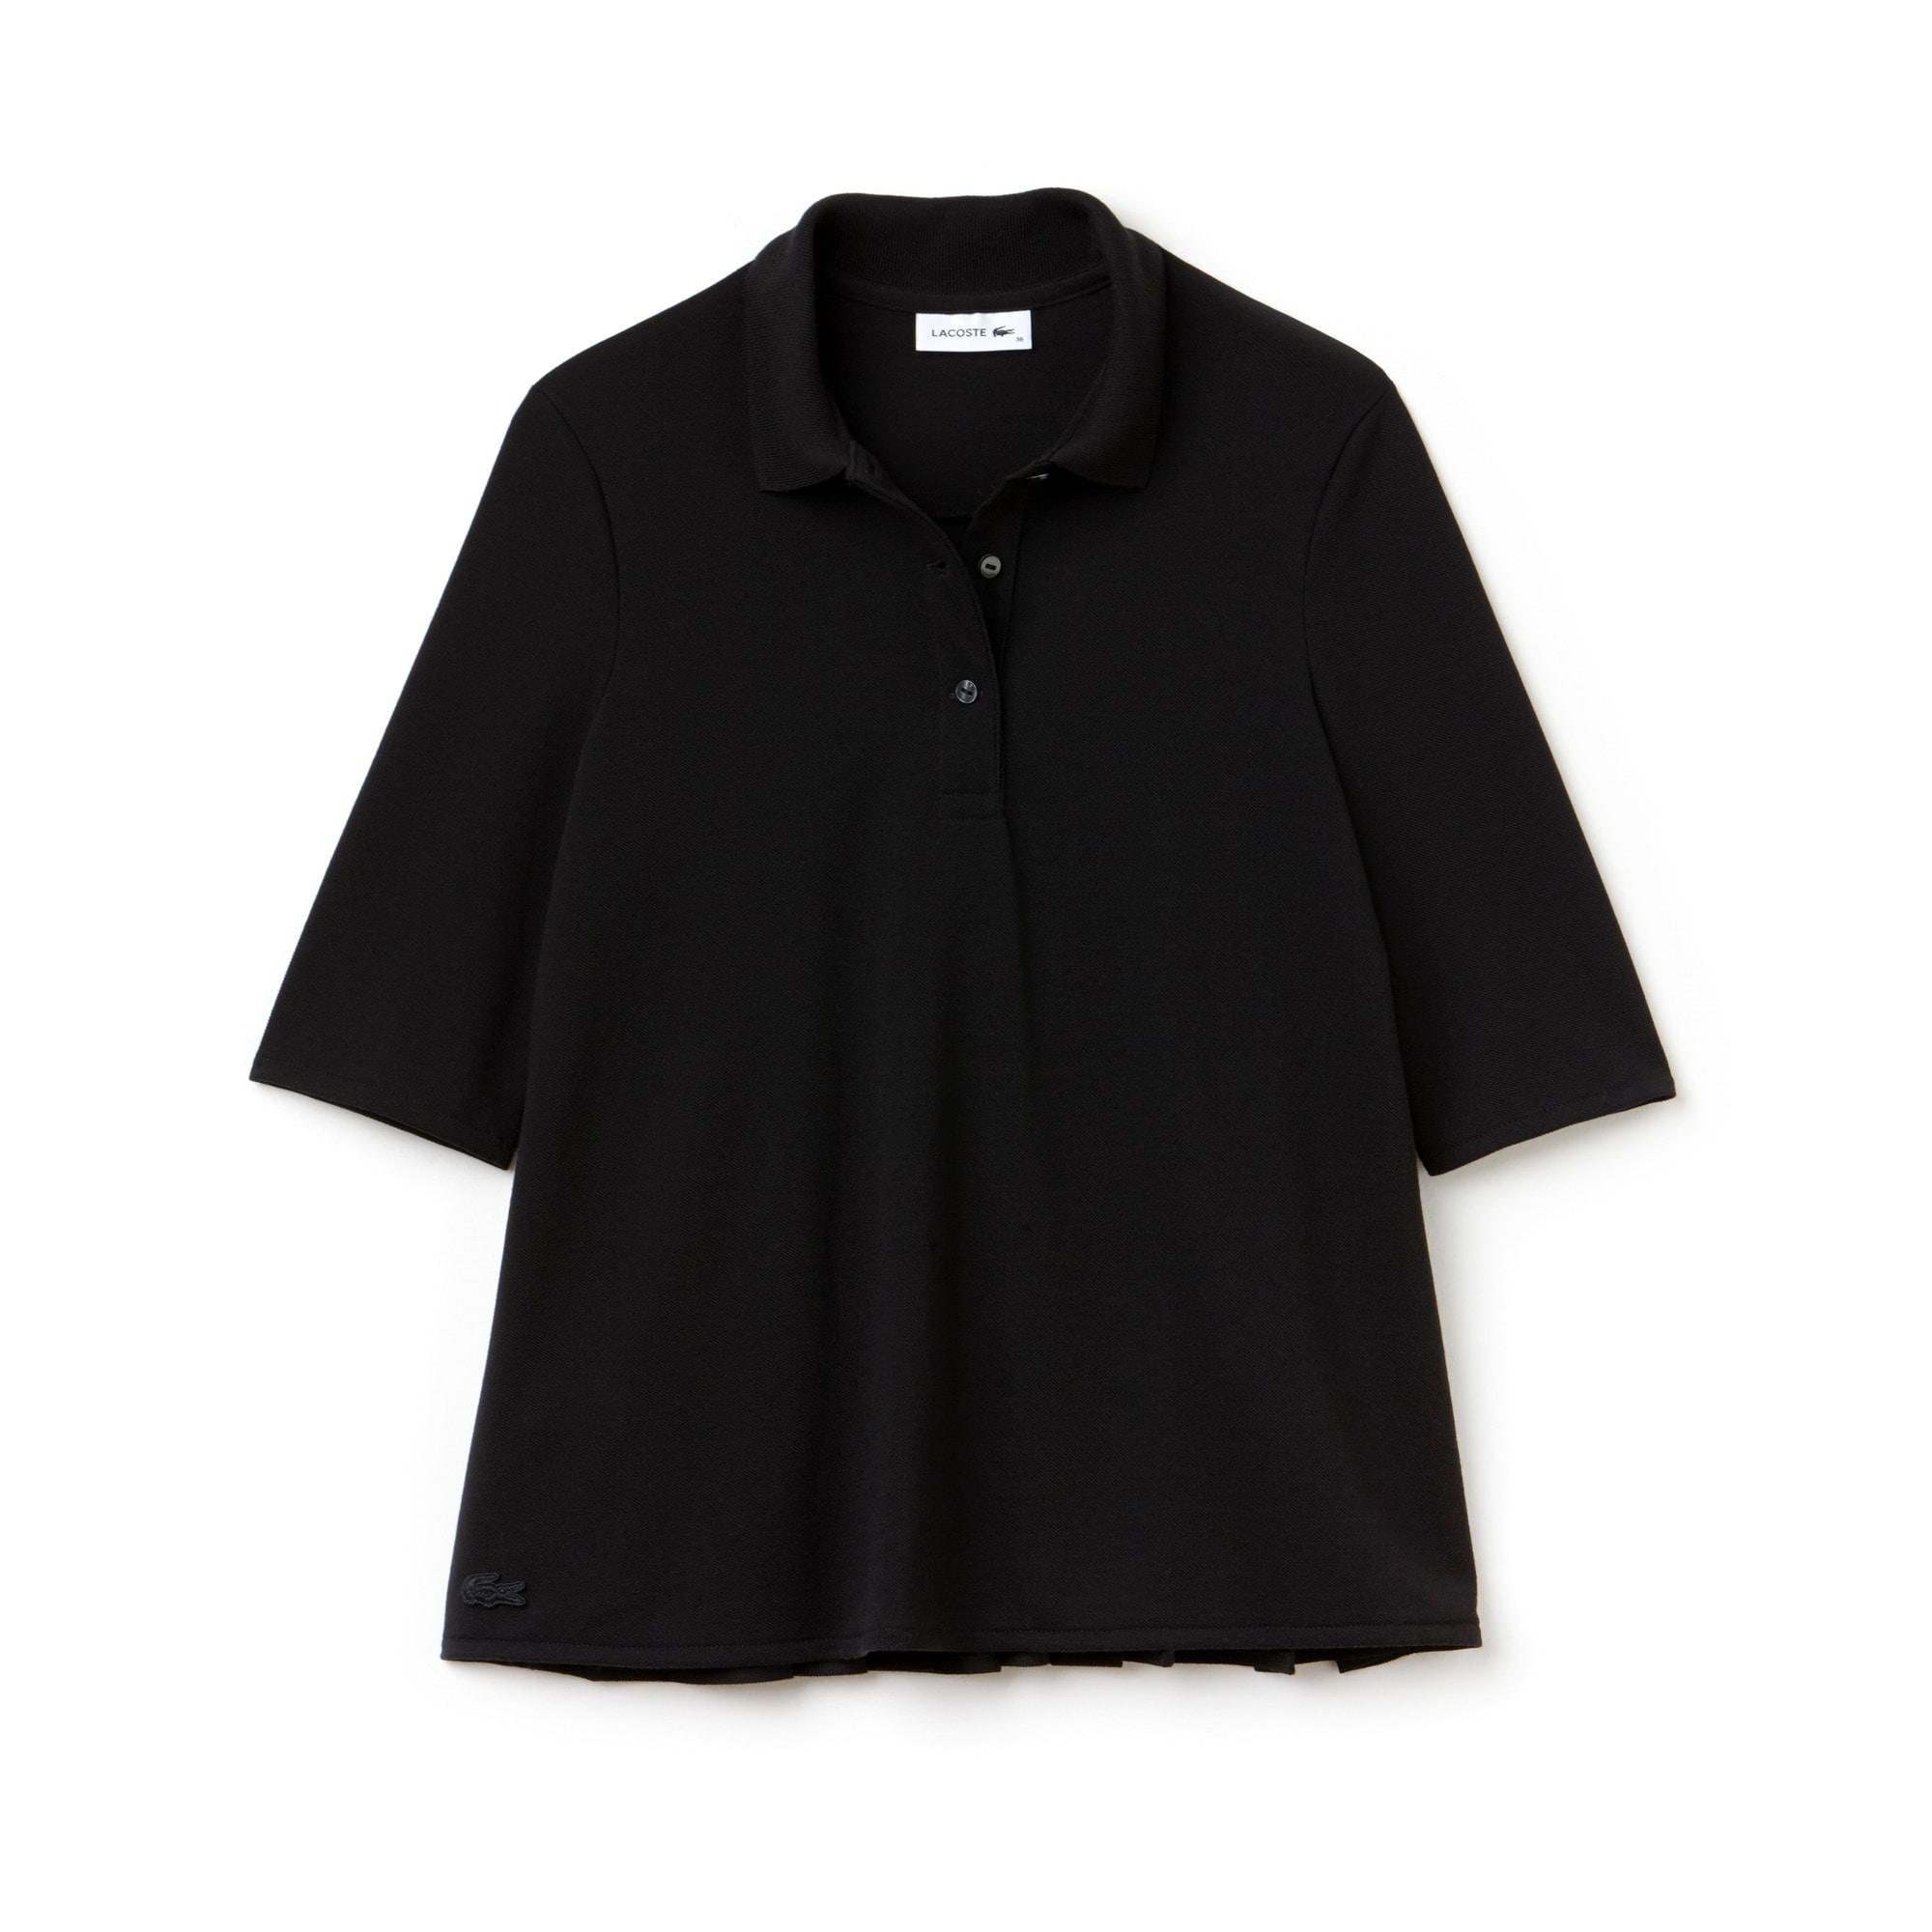 LACOSTE Damen-Poloshirt aus Petit Piqué mit Plisseerücken